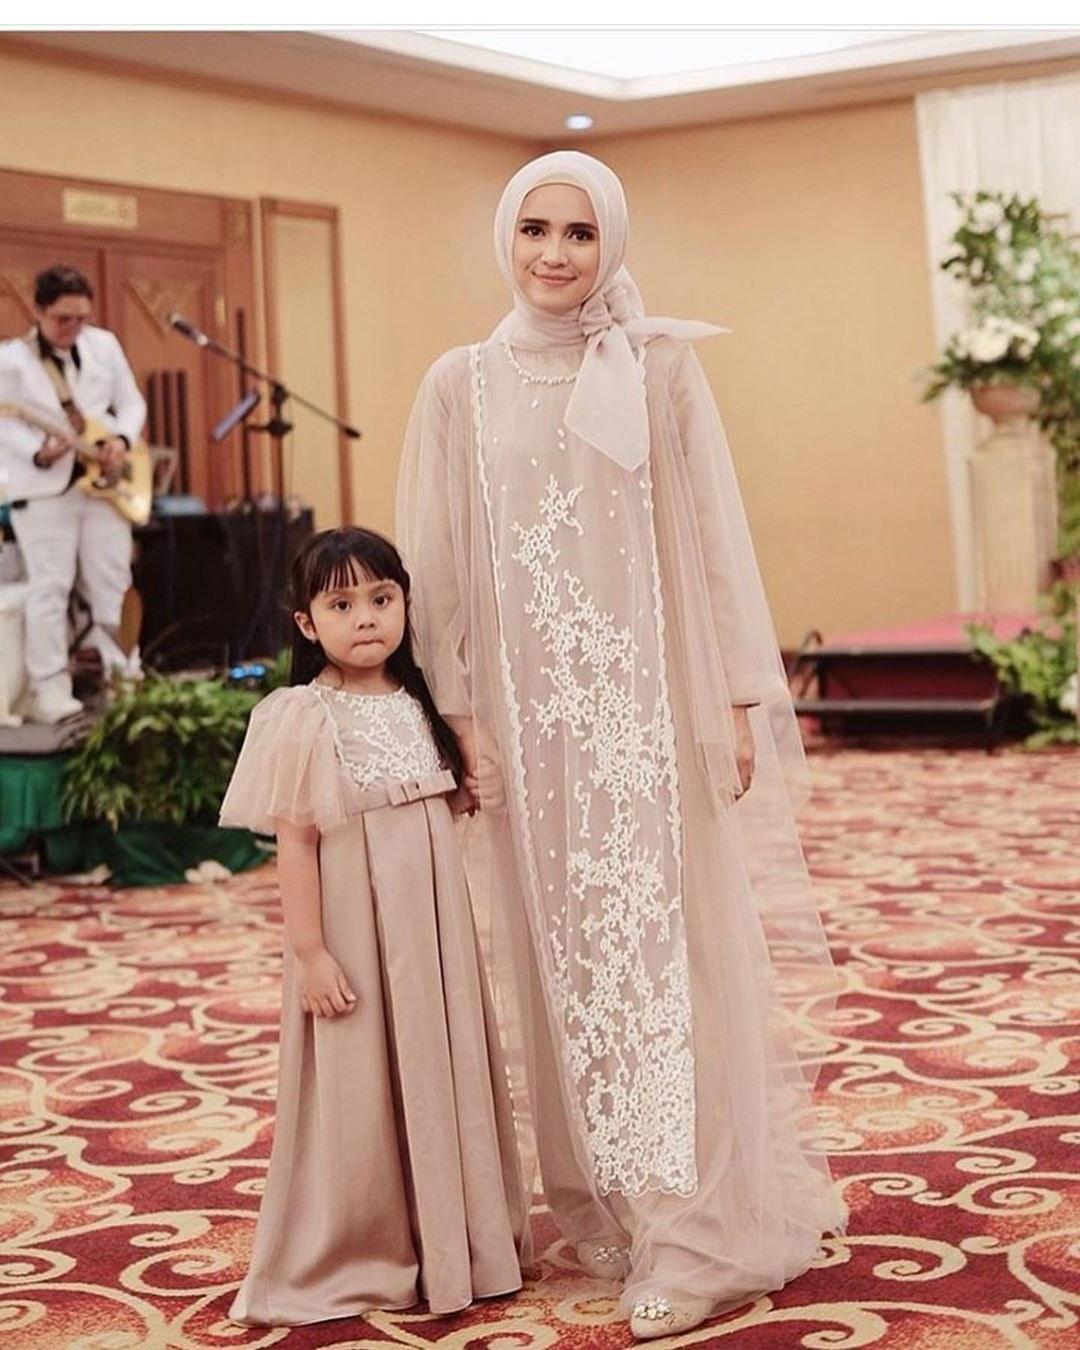 Model Baju Lebaran Remaja Terbaru 2020 Kvdd 65 Model Kebaya Muslim Brokat Modern Hijab Terbaik 2020